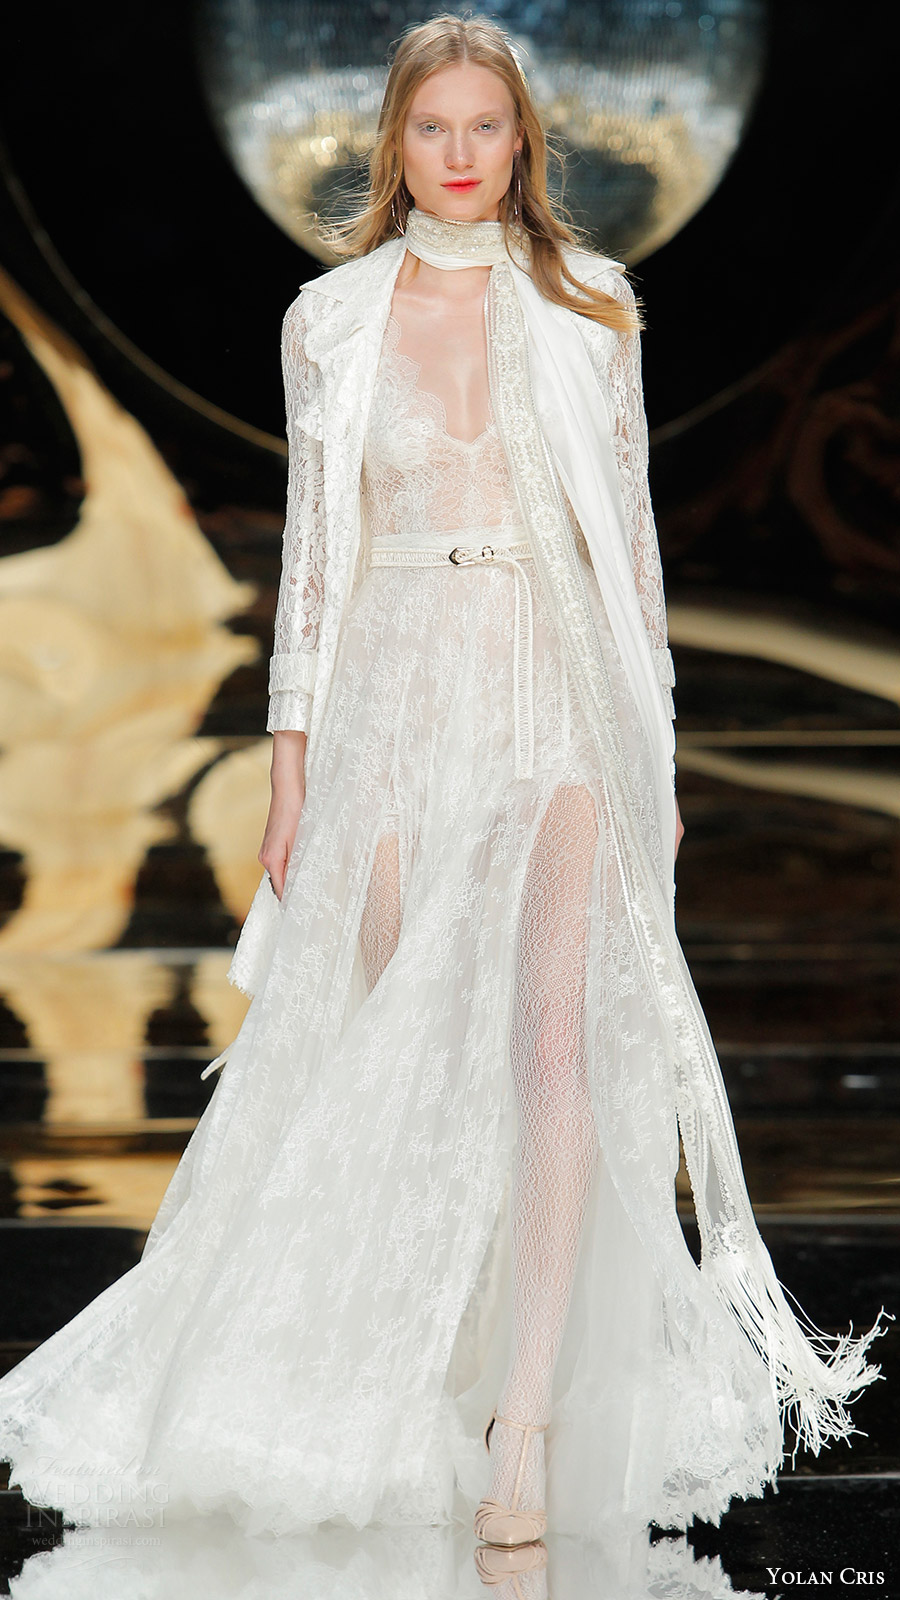 Yolancris Long Sleeve Wedding Dress : Yolan cris bridal wedding dresses inspirasi